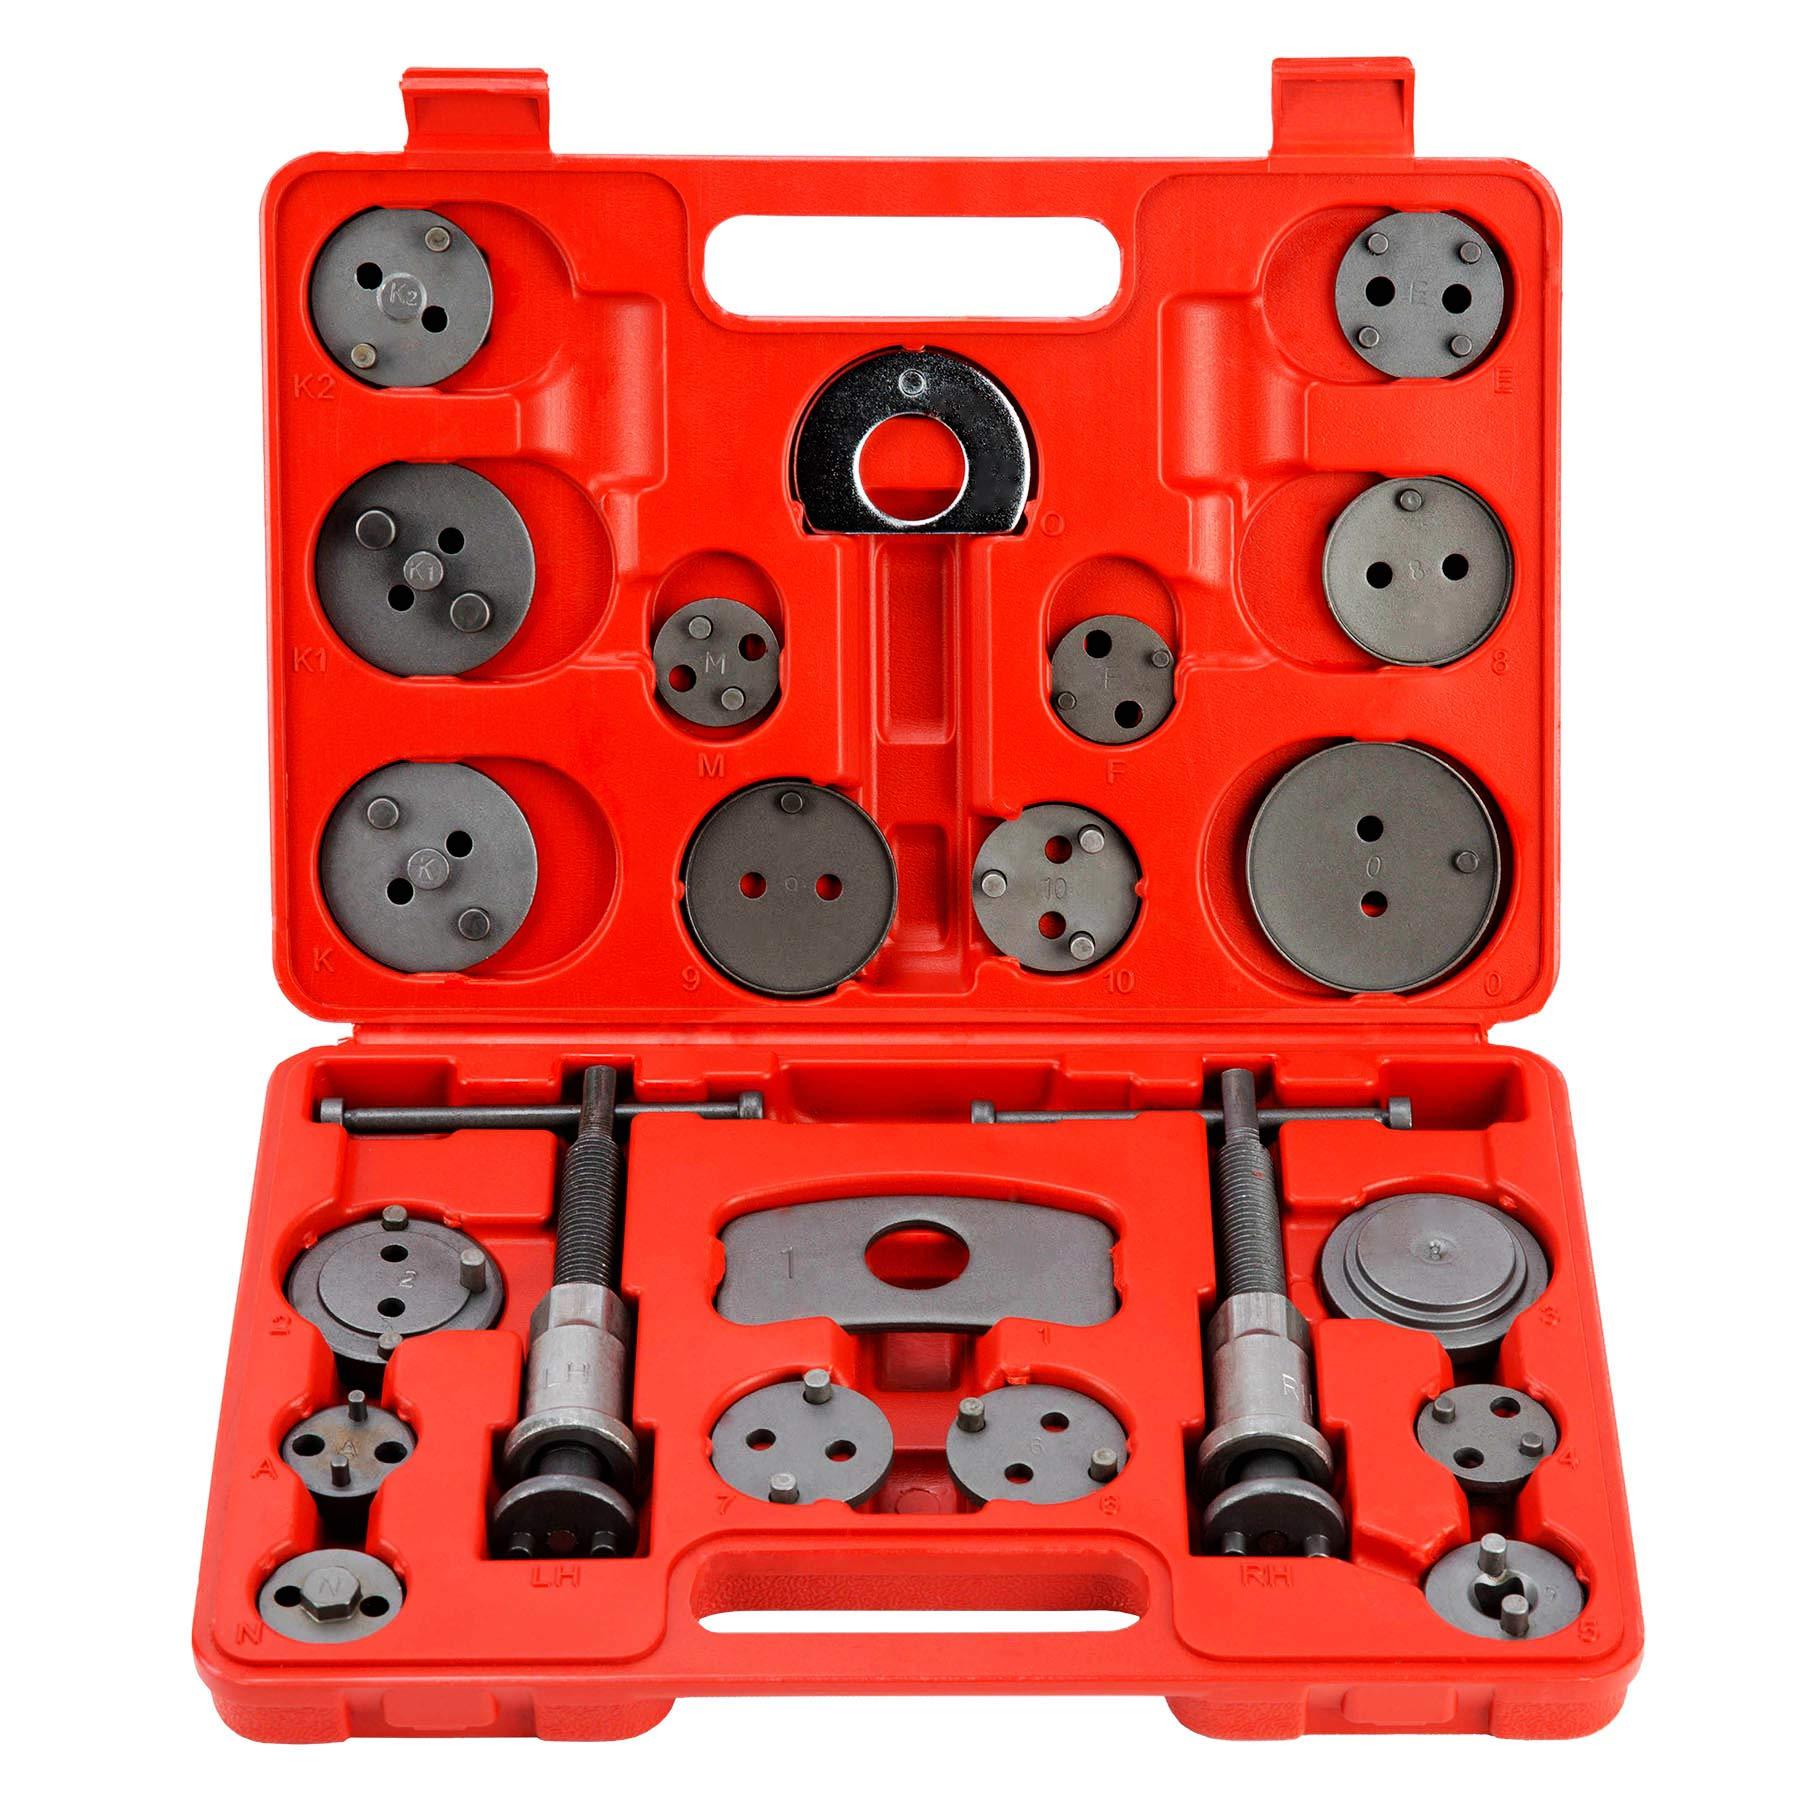 Brake Caliper Press Tool,ANTFEES Car Ratchet Brake Piston Caliper Wrench Spreader Tools Universal Brake Caliper Press Separator Pad